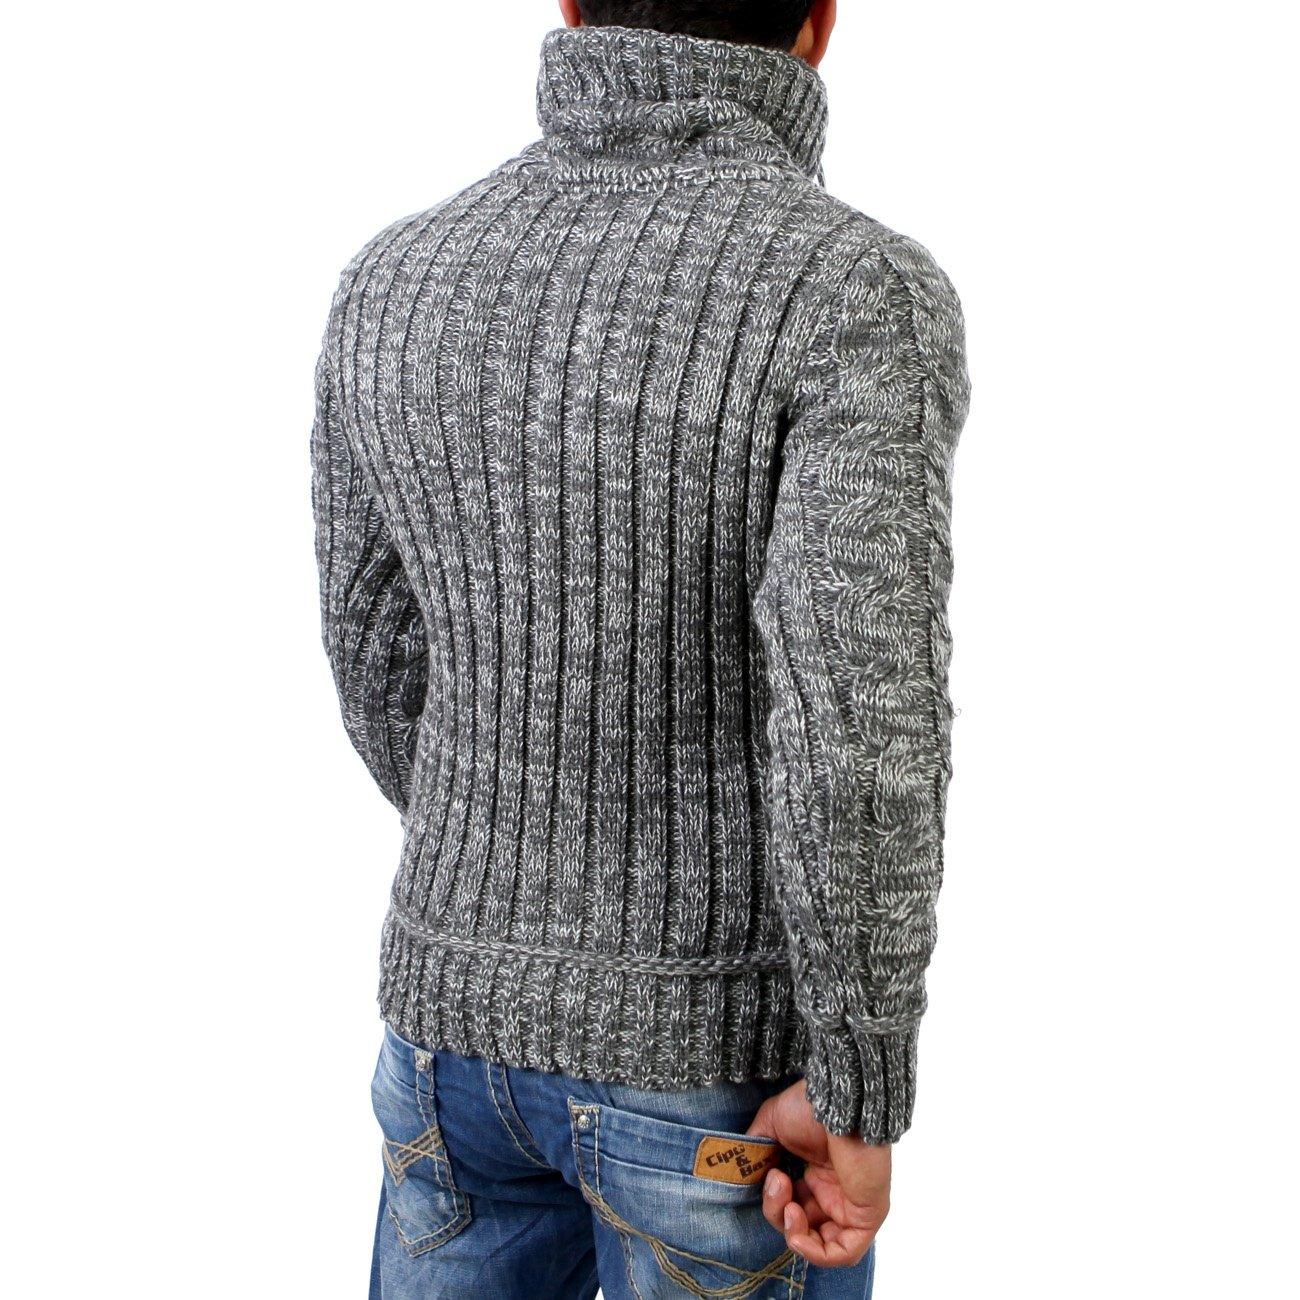 tazzio tz 3960 grobstrick huge collar winter pullover anthrazit. Black Bedroom Furniture Sets. Home Design Ideas